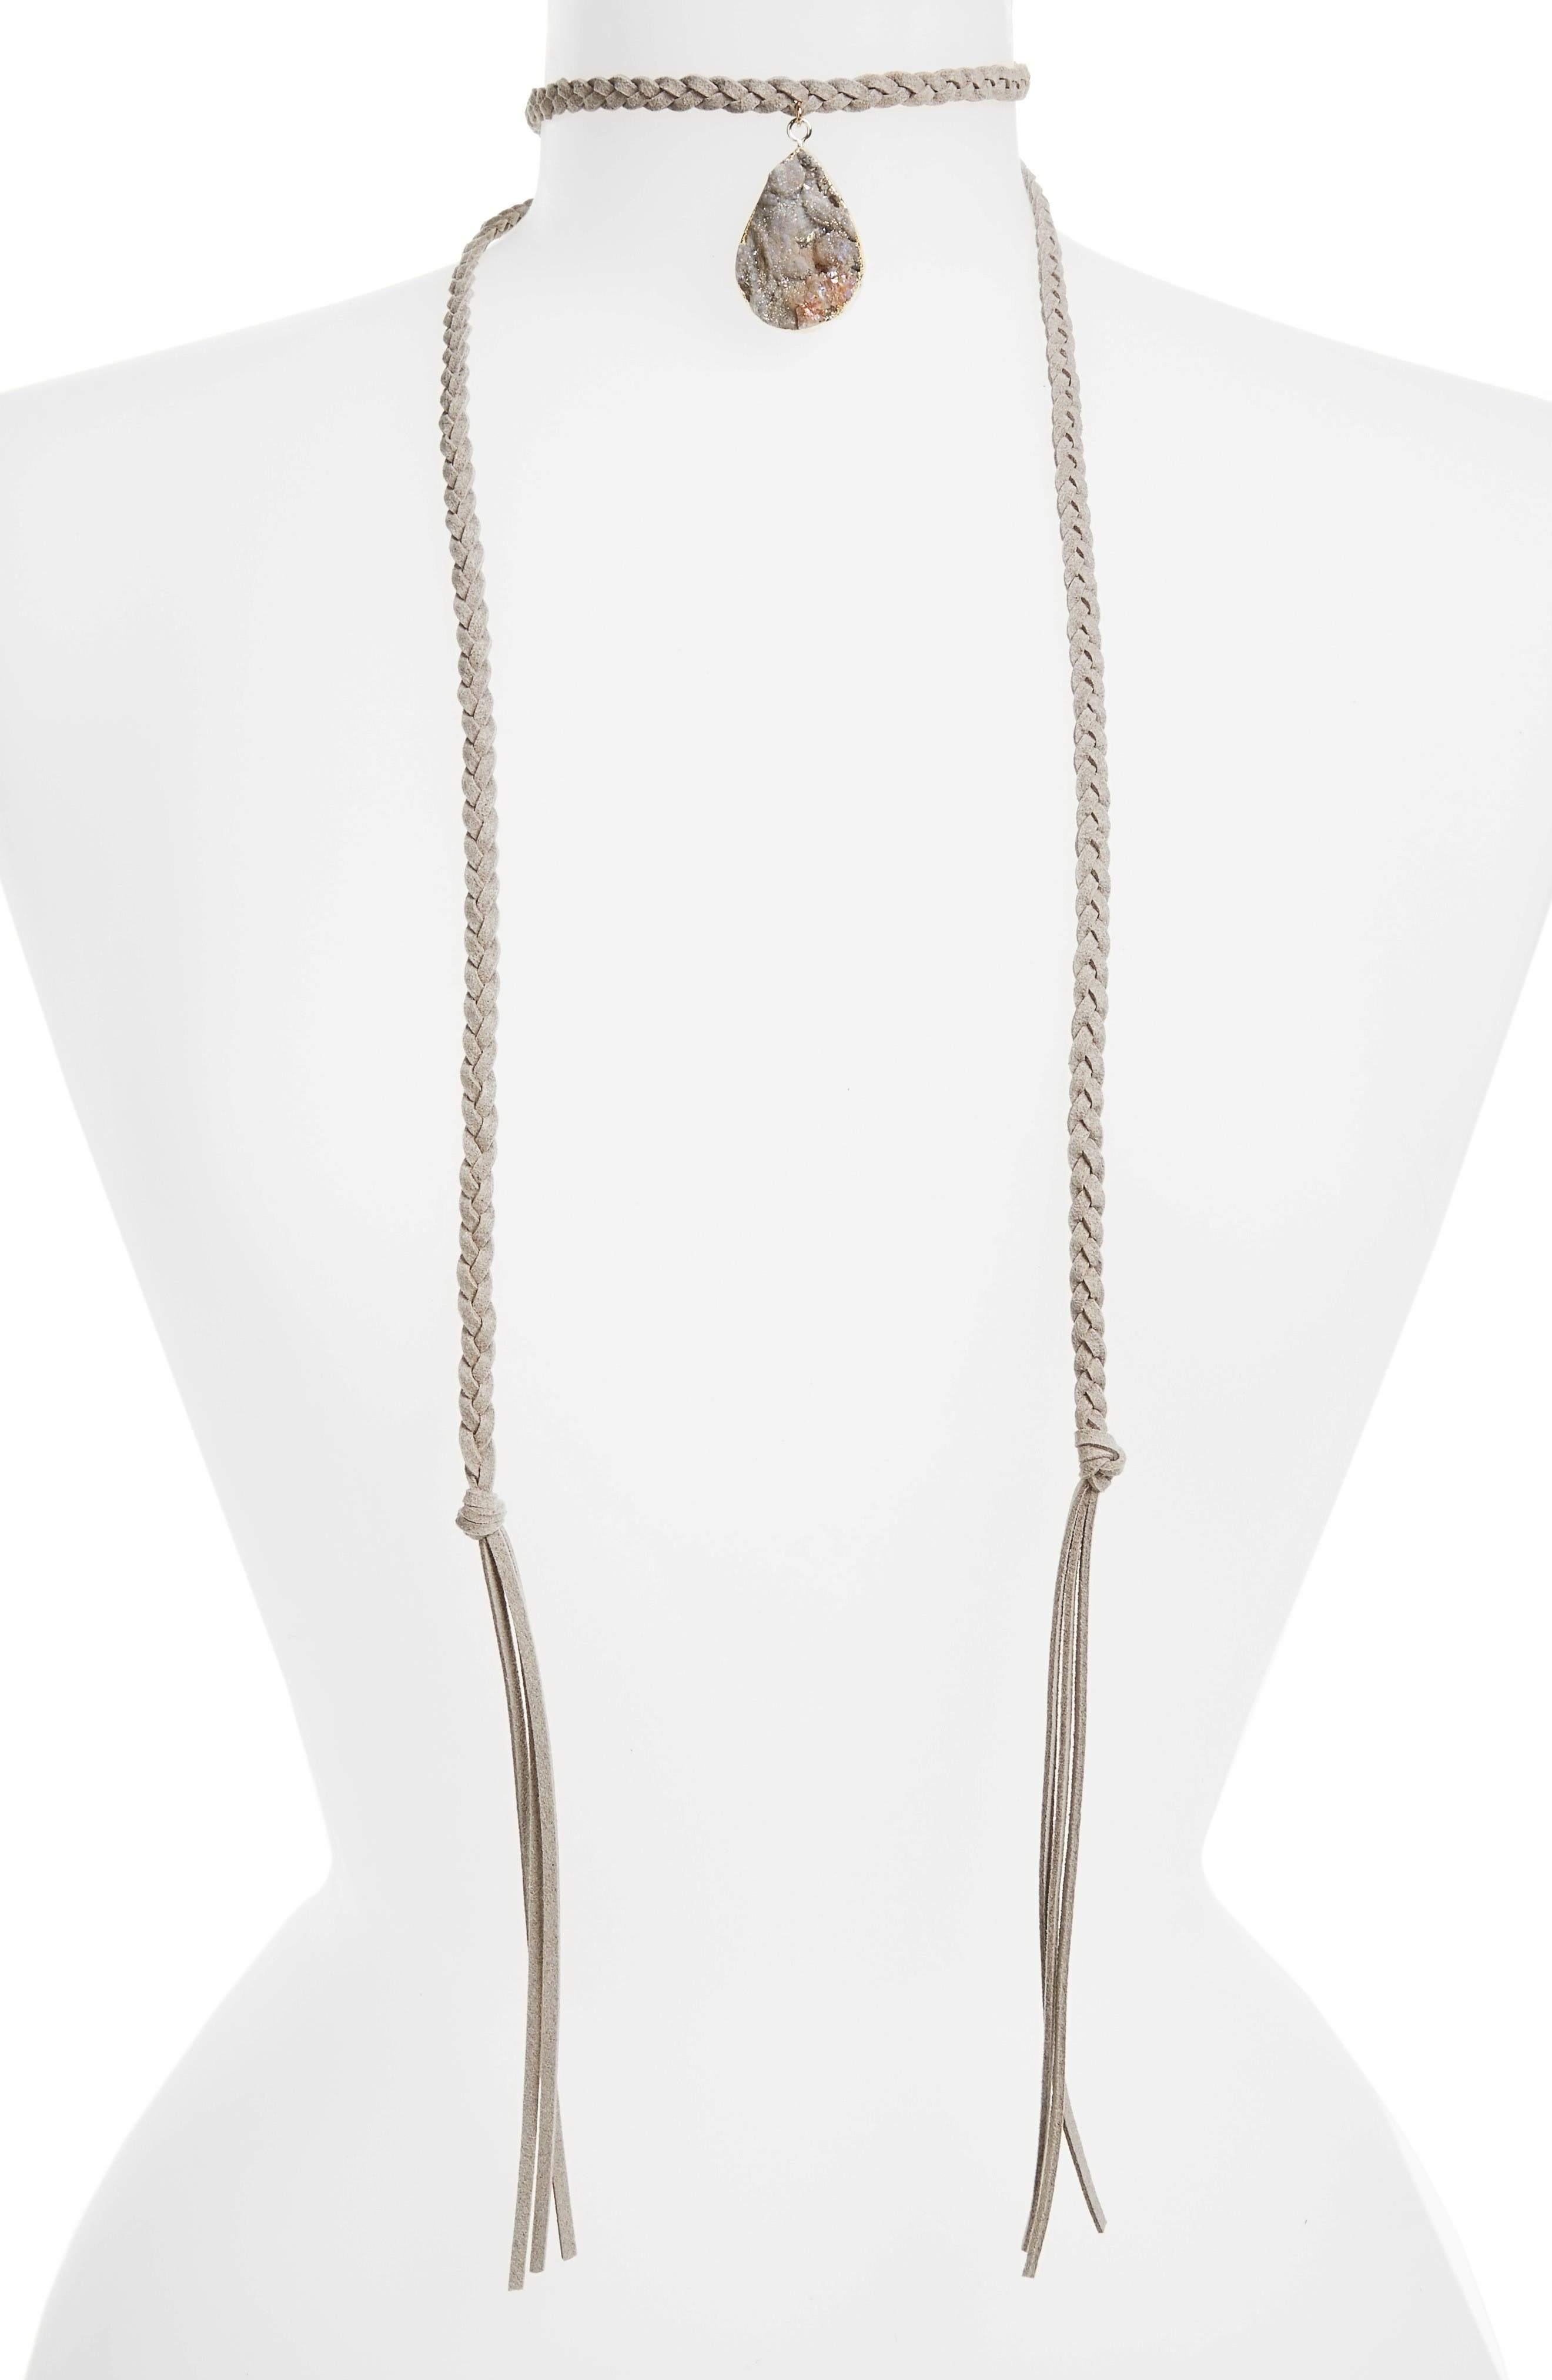 Alternate Image 1 Selected - Panacea Long Wrap Choker Necklace